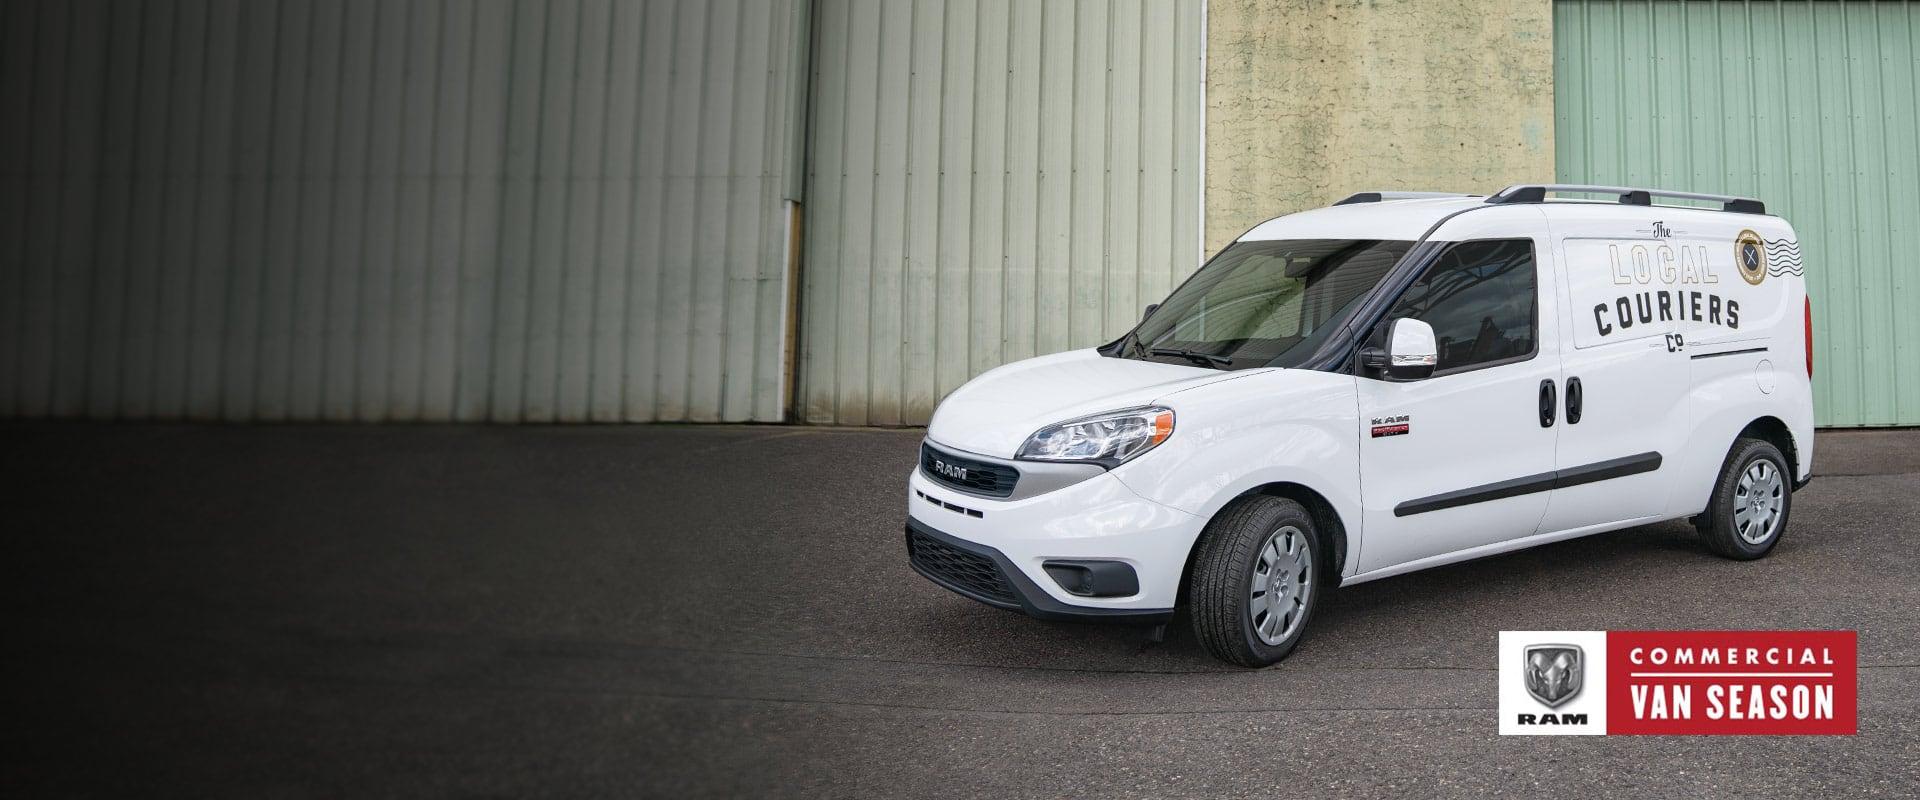 Ram Commercial Van Season